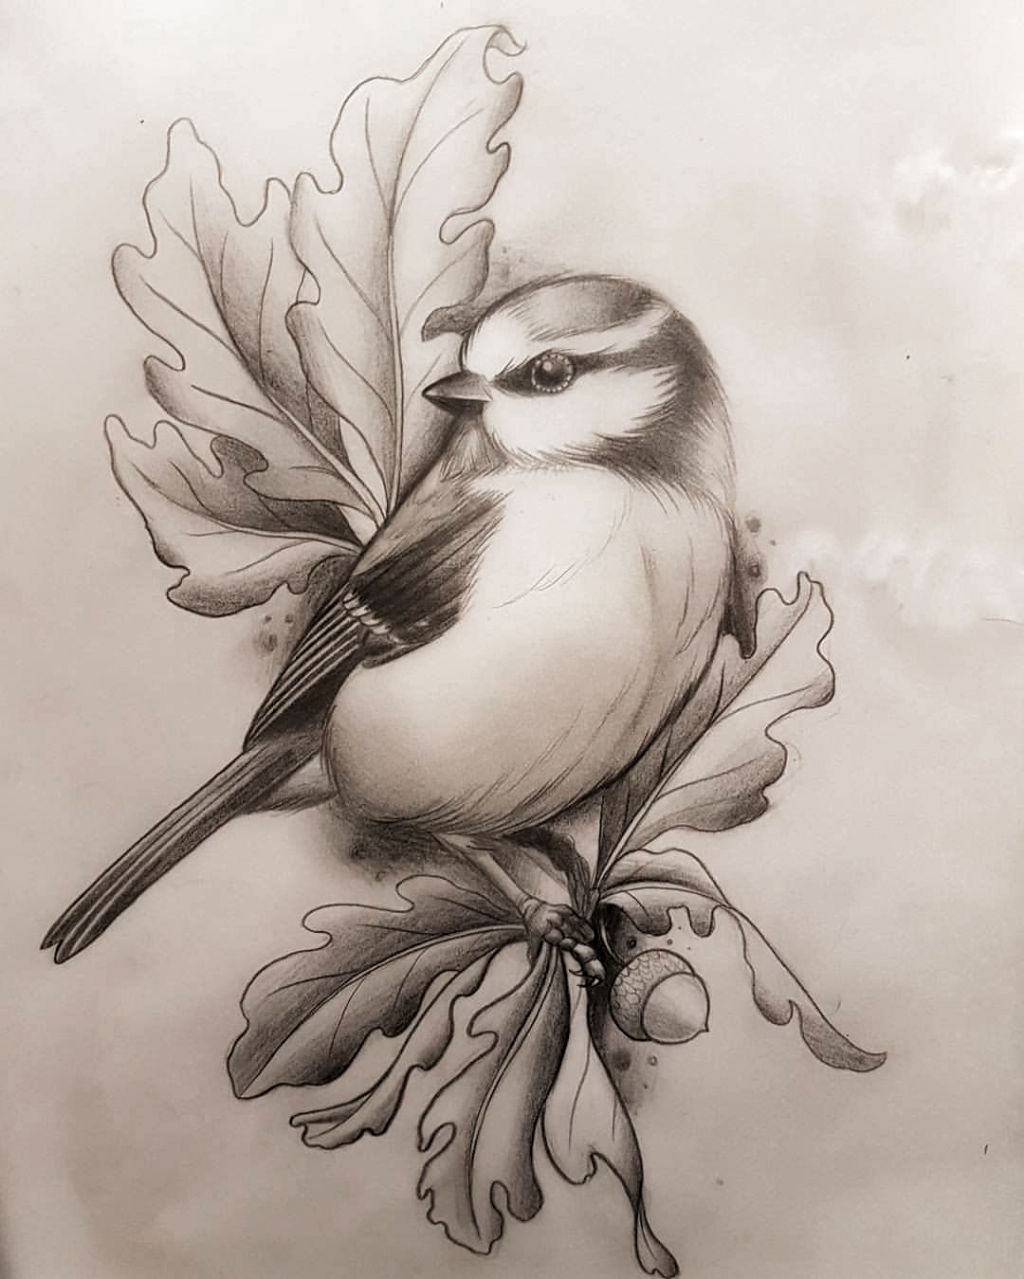 Pin By Aurea Reyes On Art Sketches In 2020 Art Drawings Sketches Simple Art Drawings Sketches Creative Animal Drawings Sketches